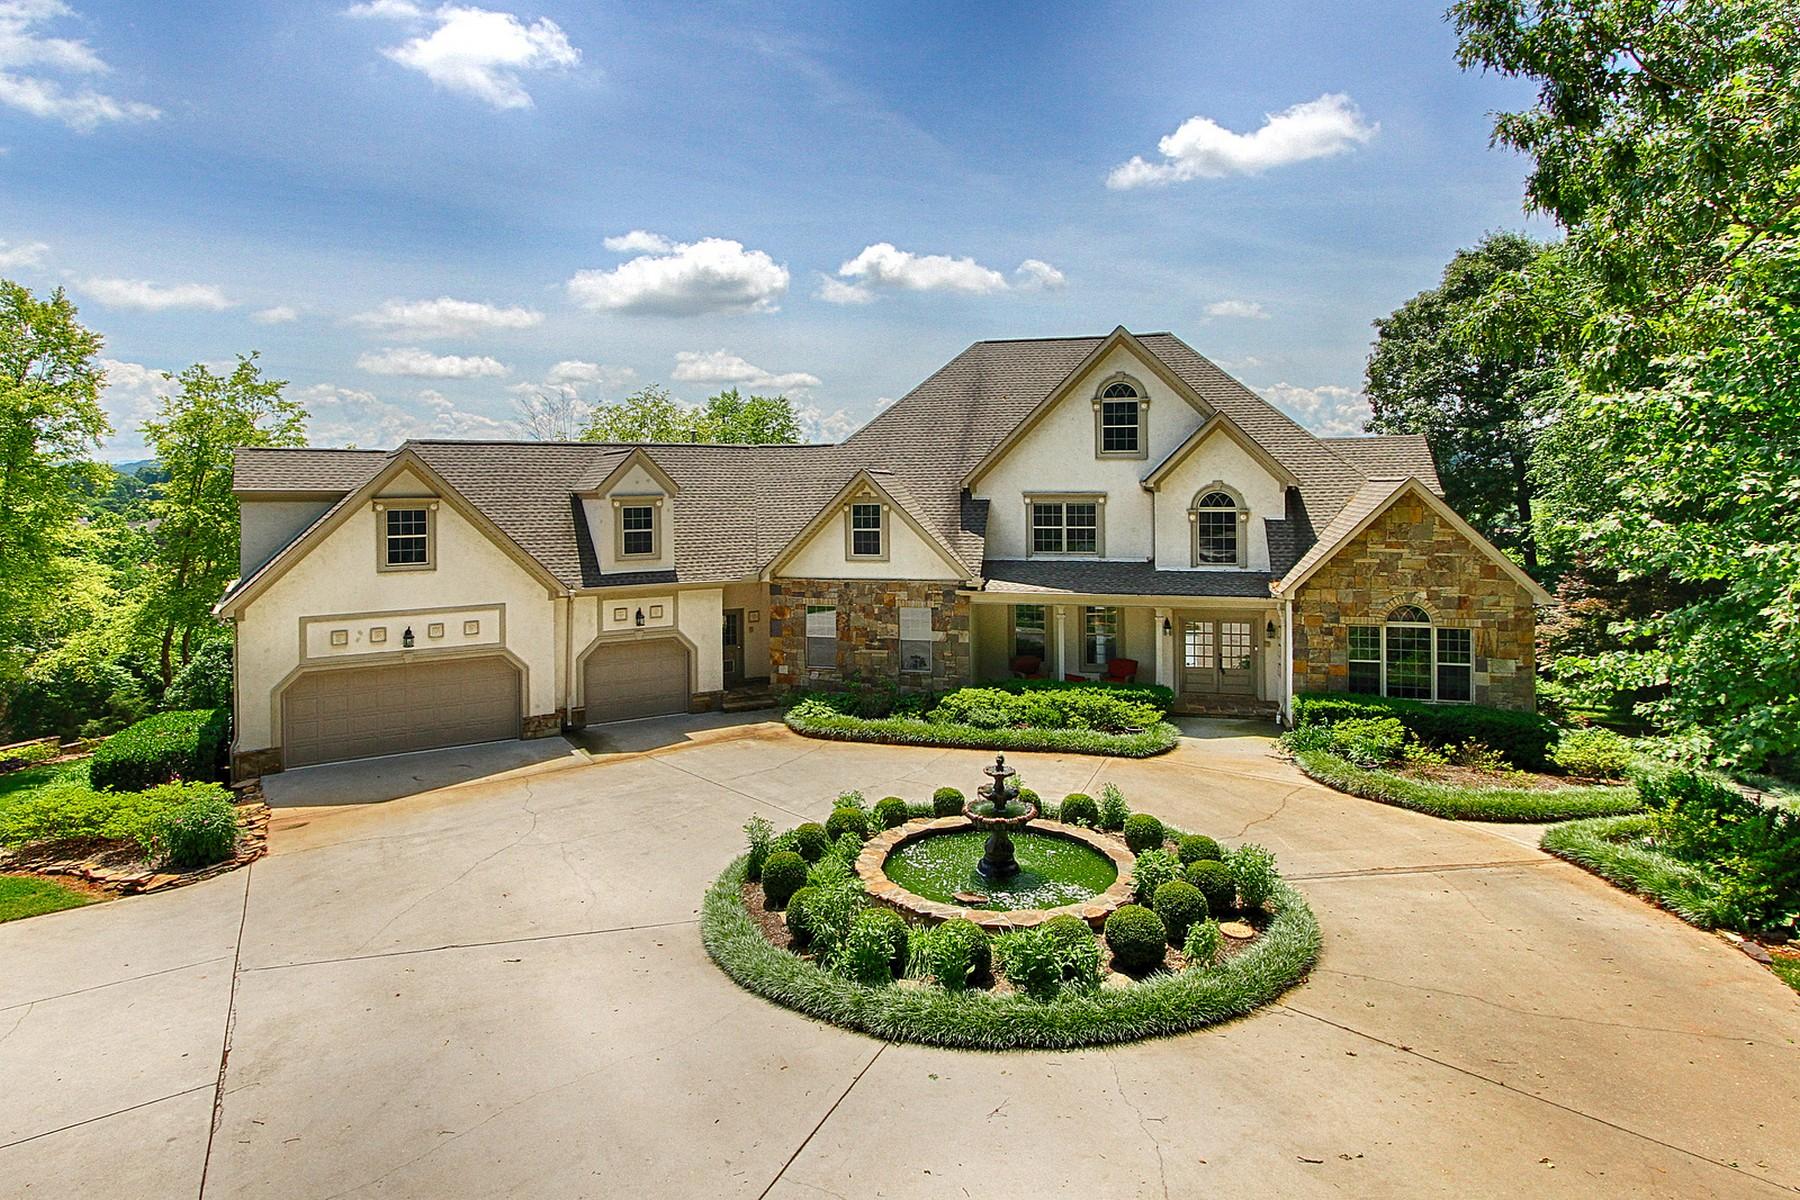 Moradia para Venda às Lakefront Estate With Mountain Views 7044 Lake Bluff Court Knoxville, Tennessee, 37920 Estados Unidos